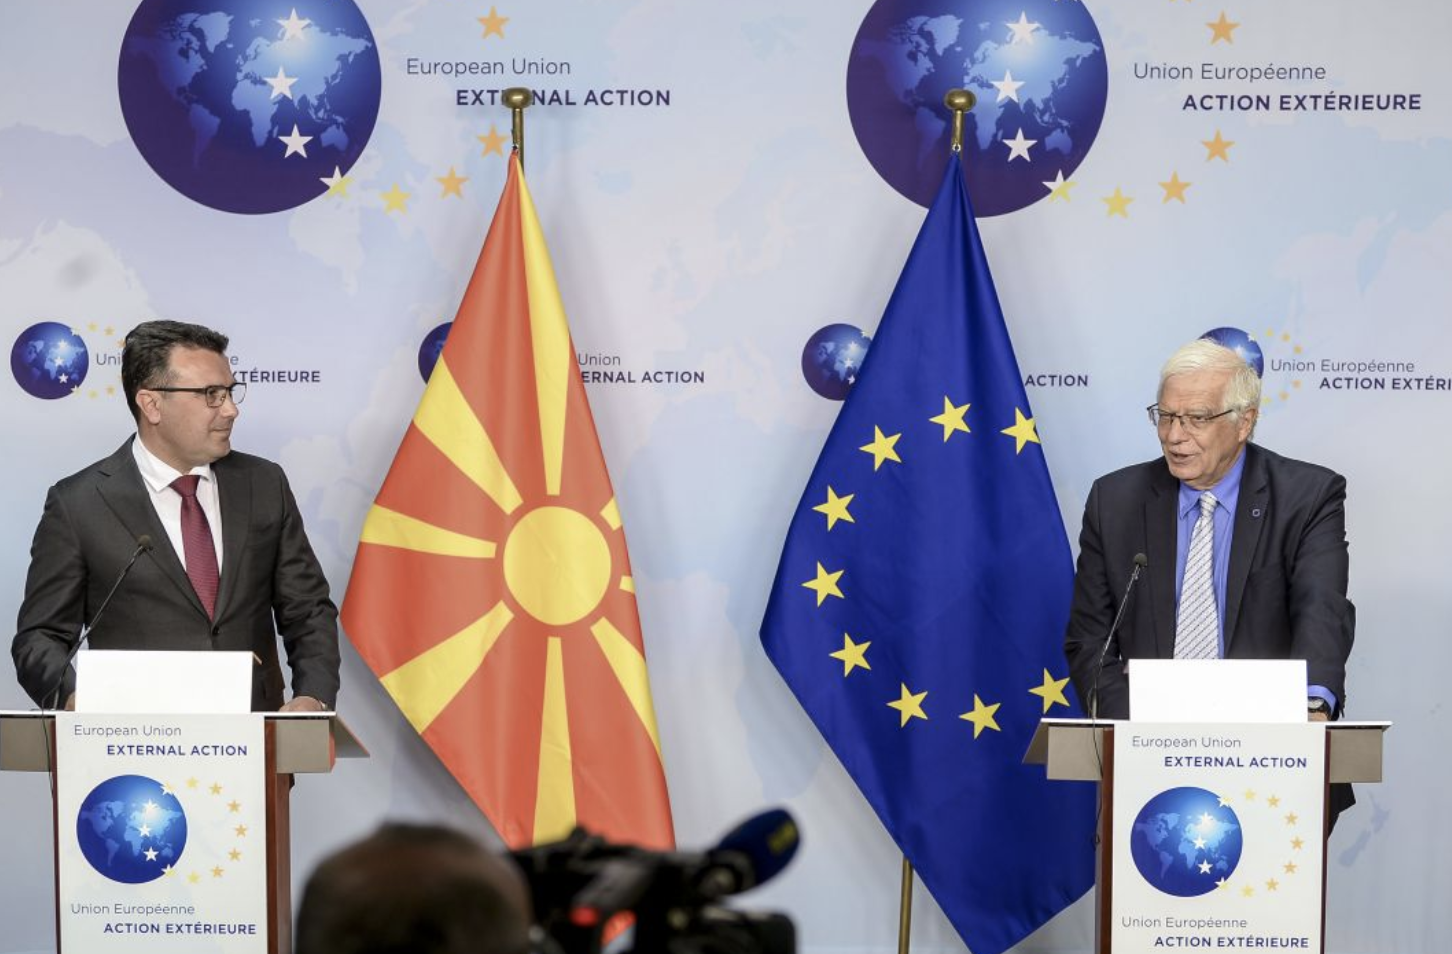 Borrell: Δεν υπάρχει υποστήριξη στην αποσύνδεση Βόρειας Μακεδονίας Αλβανίας